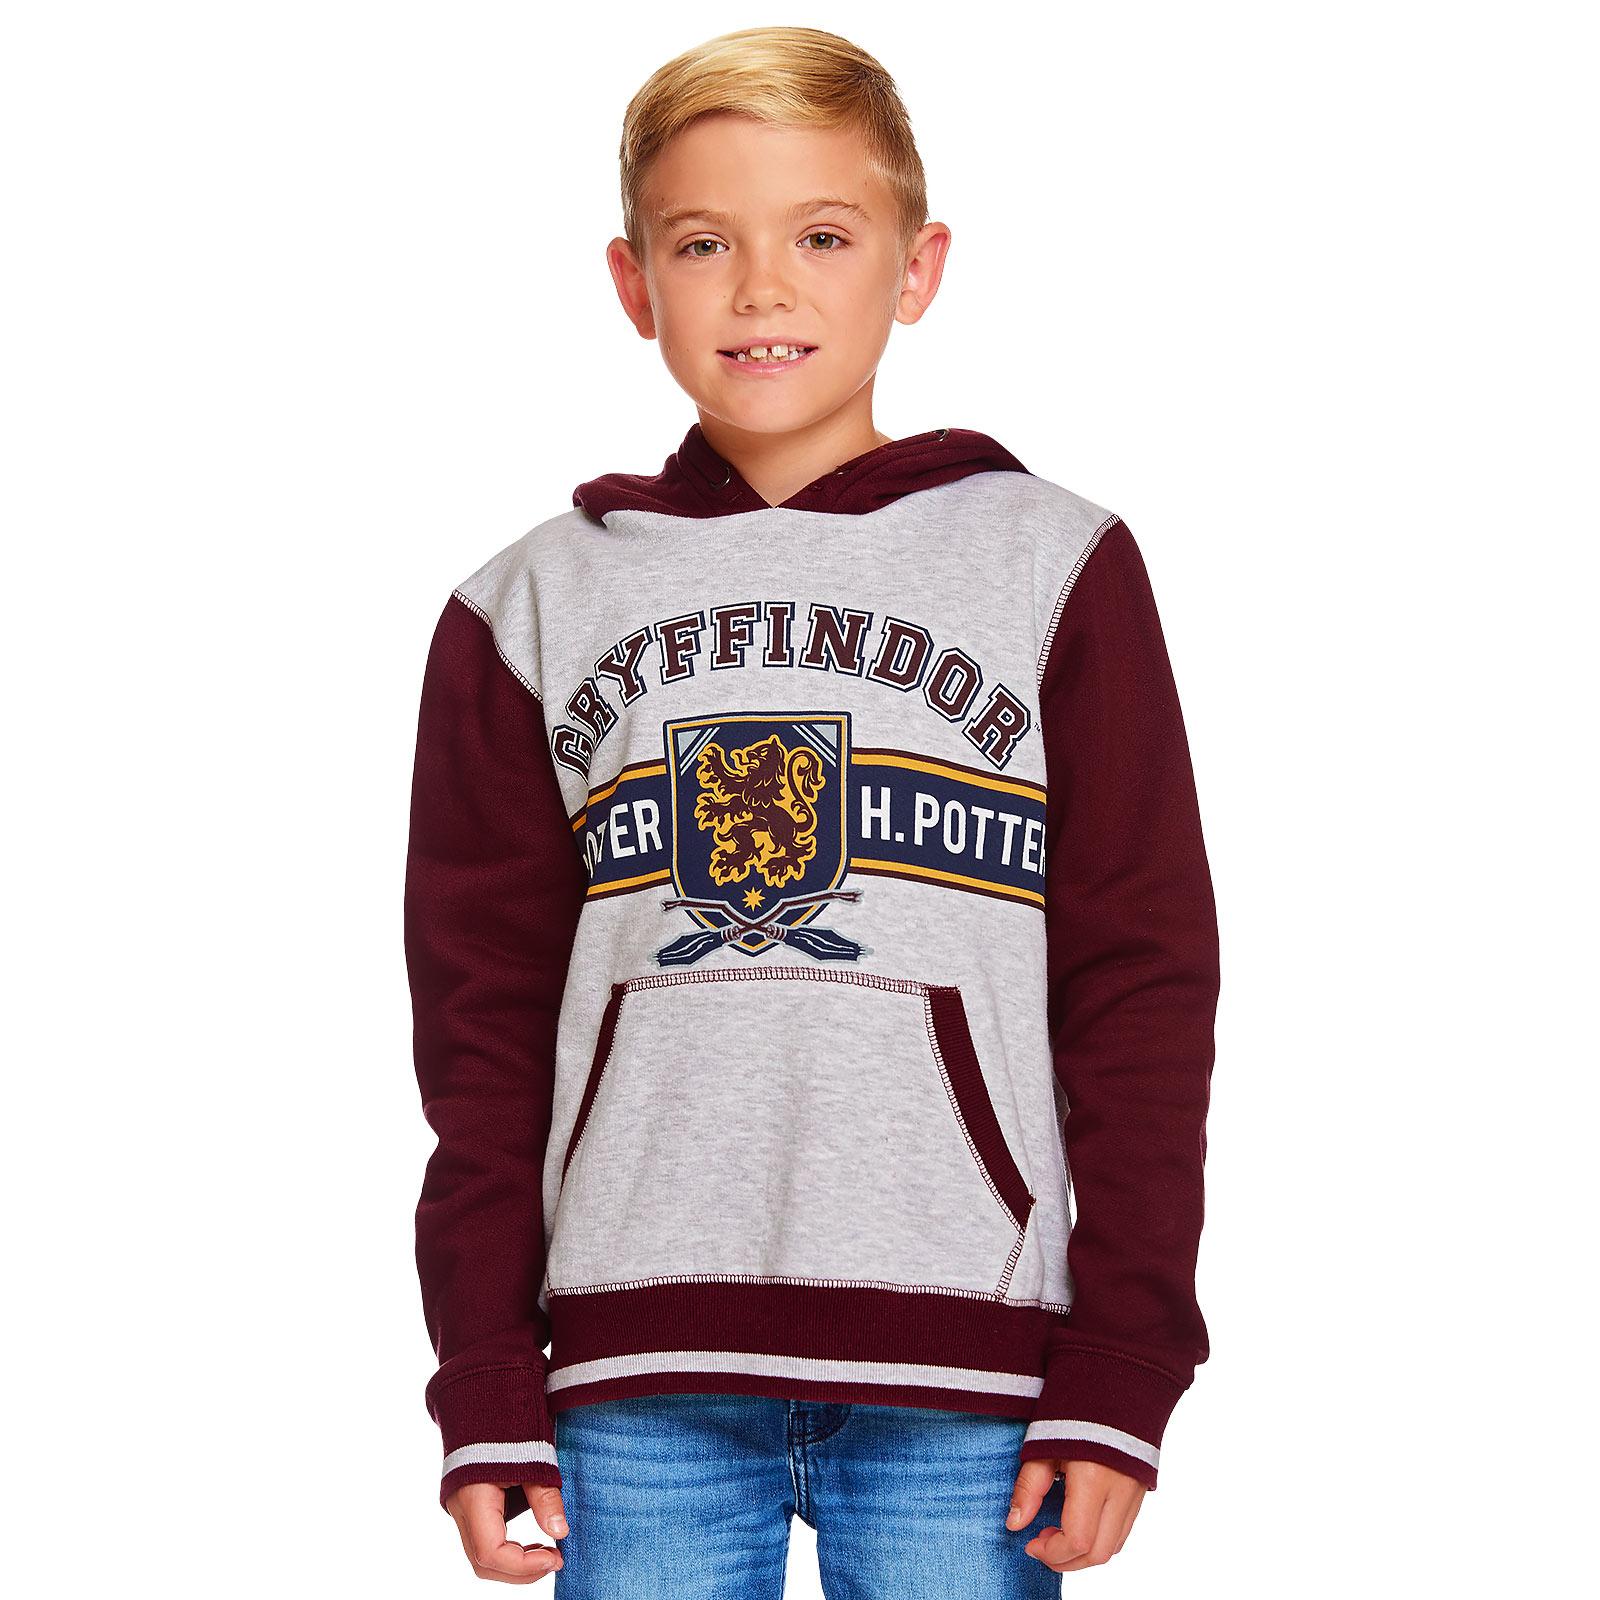 Harry Potter - Gryffindor Kinder Hoodie grau-rot